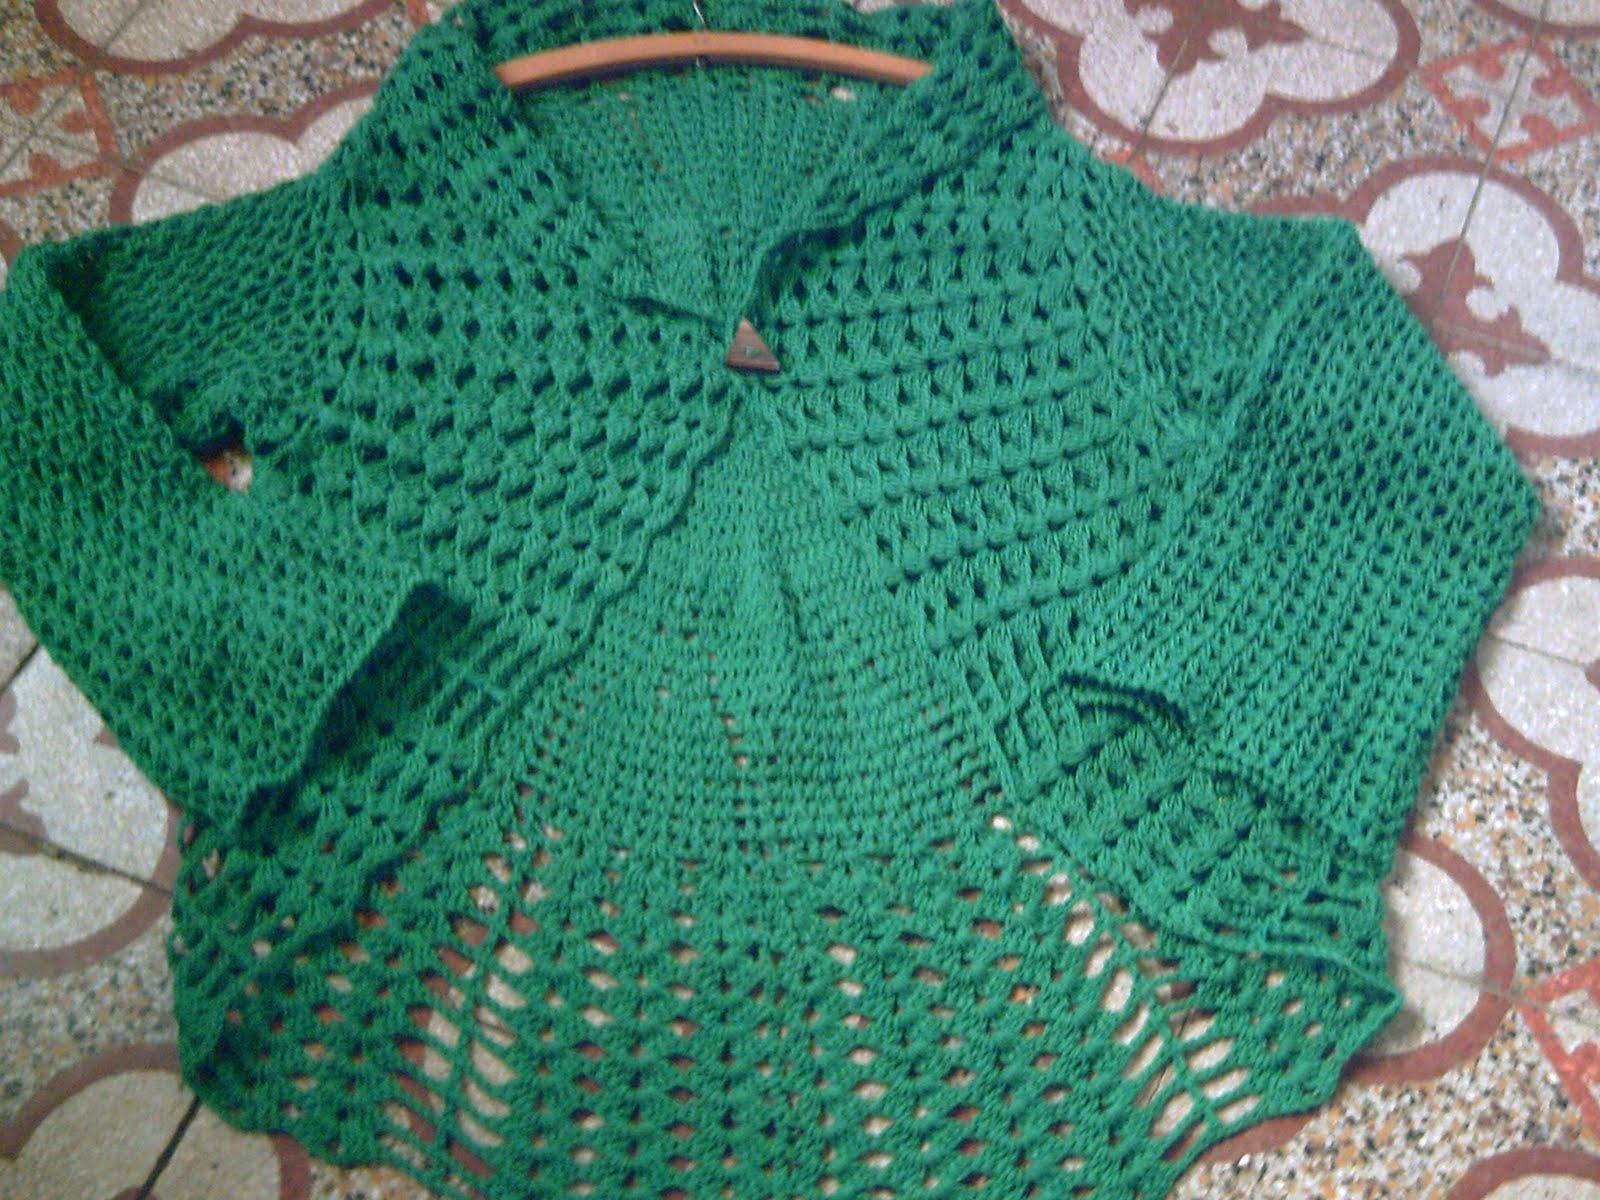 chaleco circular con mangas, tejido a crochet con hilo de algodòn